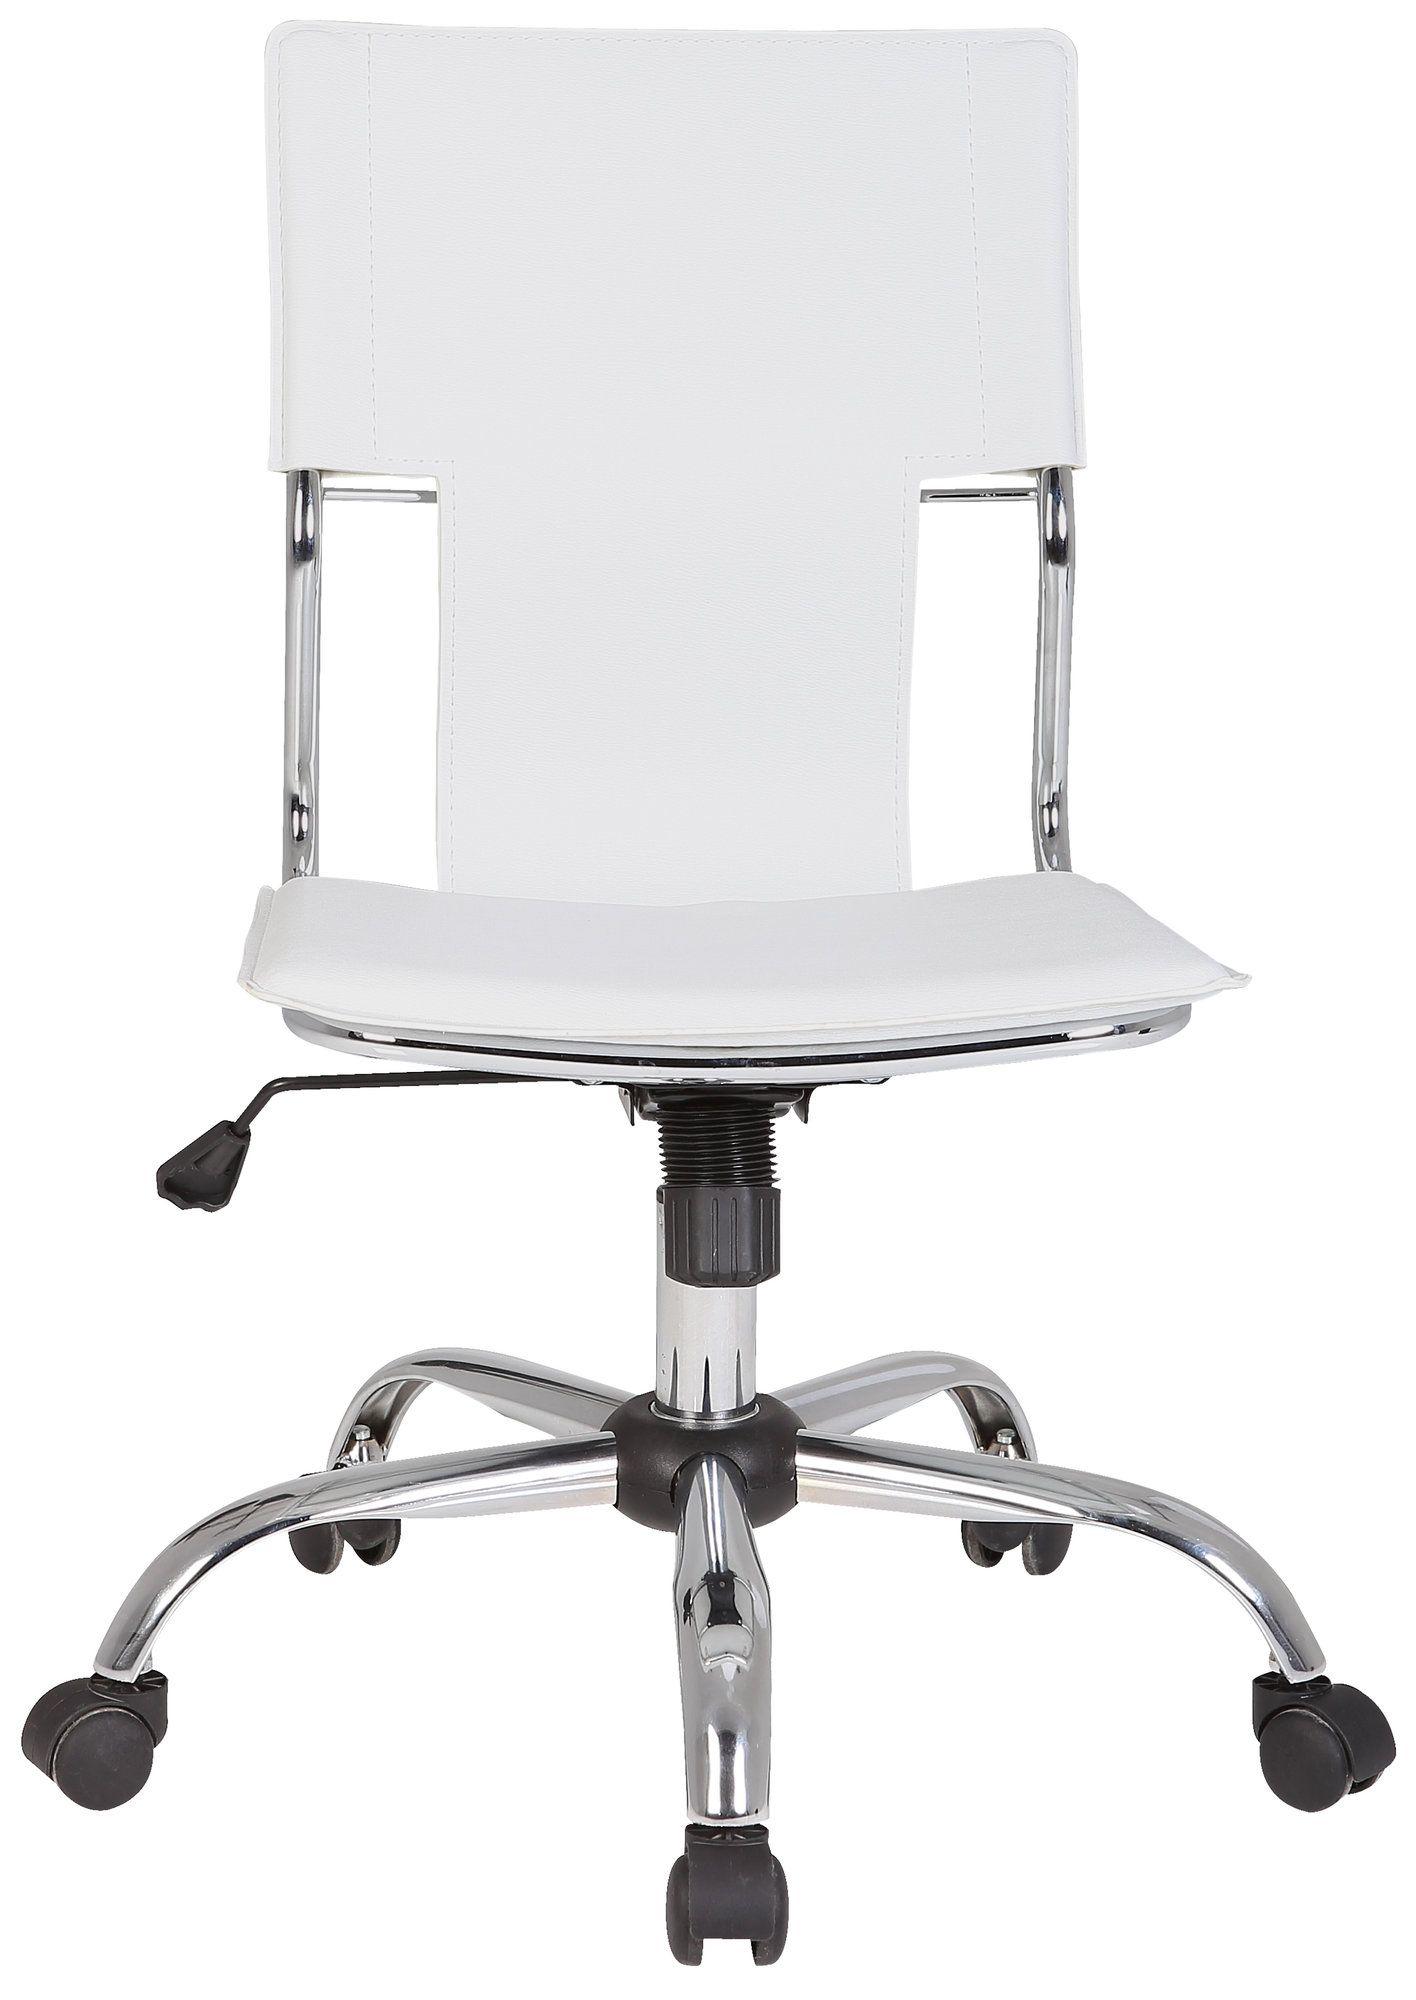 London Task Chair Chair, Global office furniture, Simple